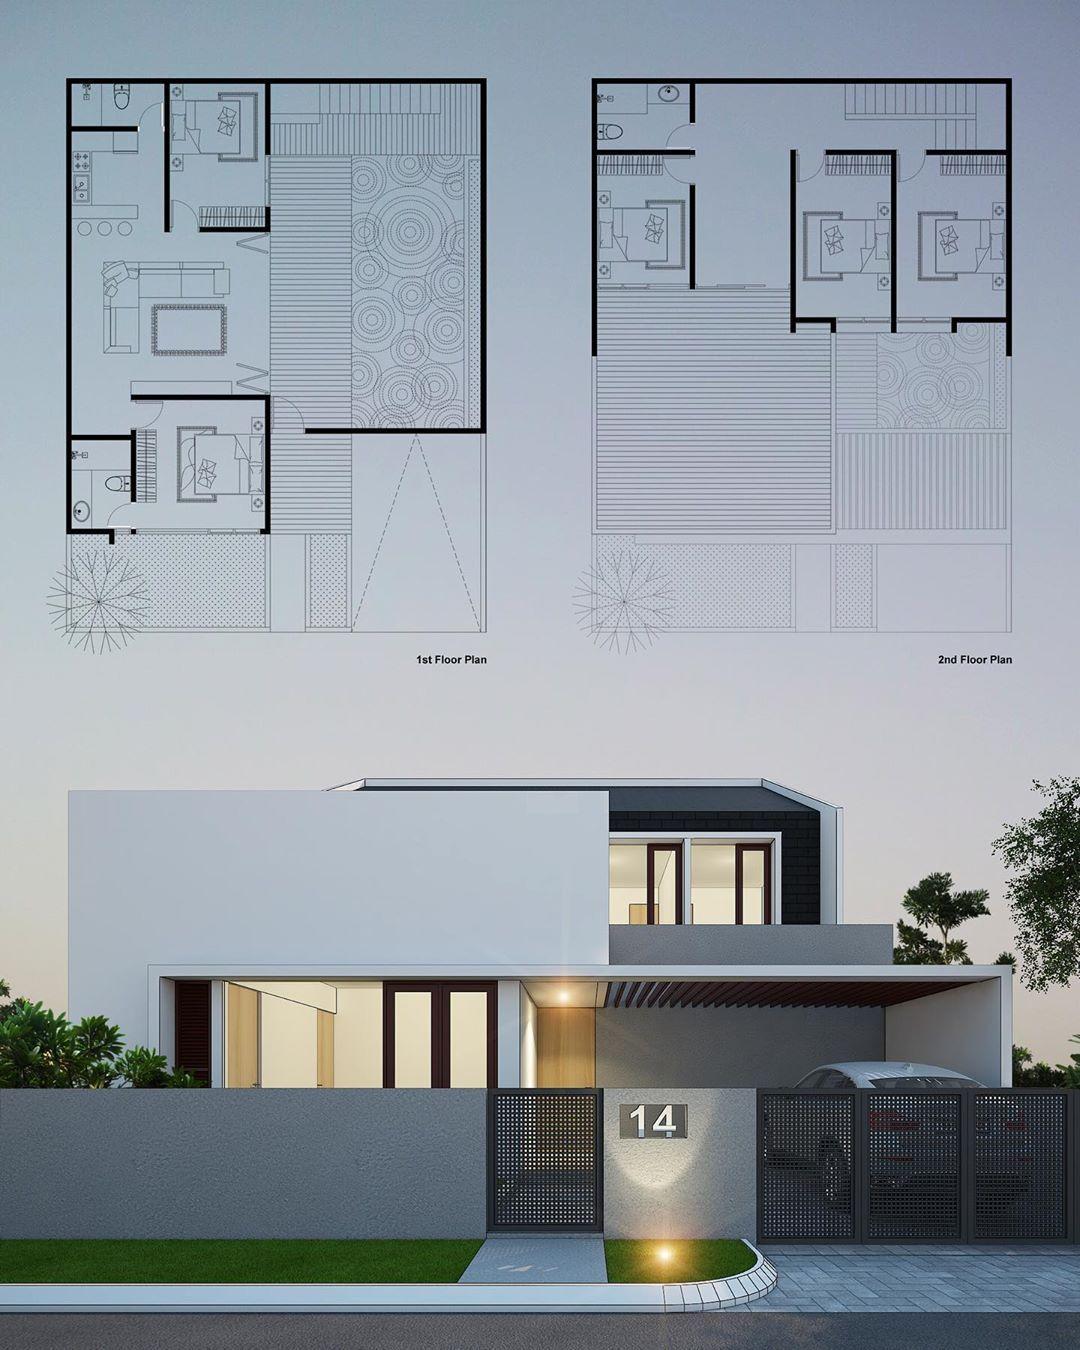 Rekabentuk Id Architecture Design Arsitektur Arsitekturindonesia Desain House Housedesign Arqui Home Building Design Facade House Classic House Design